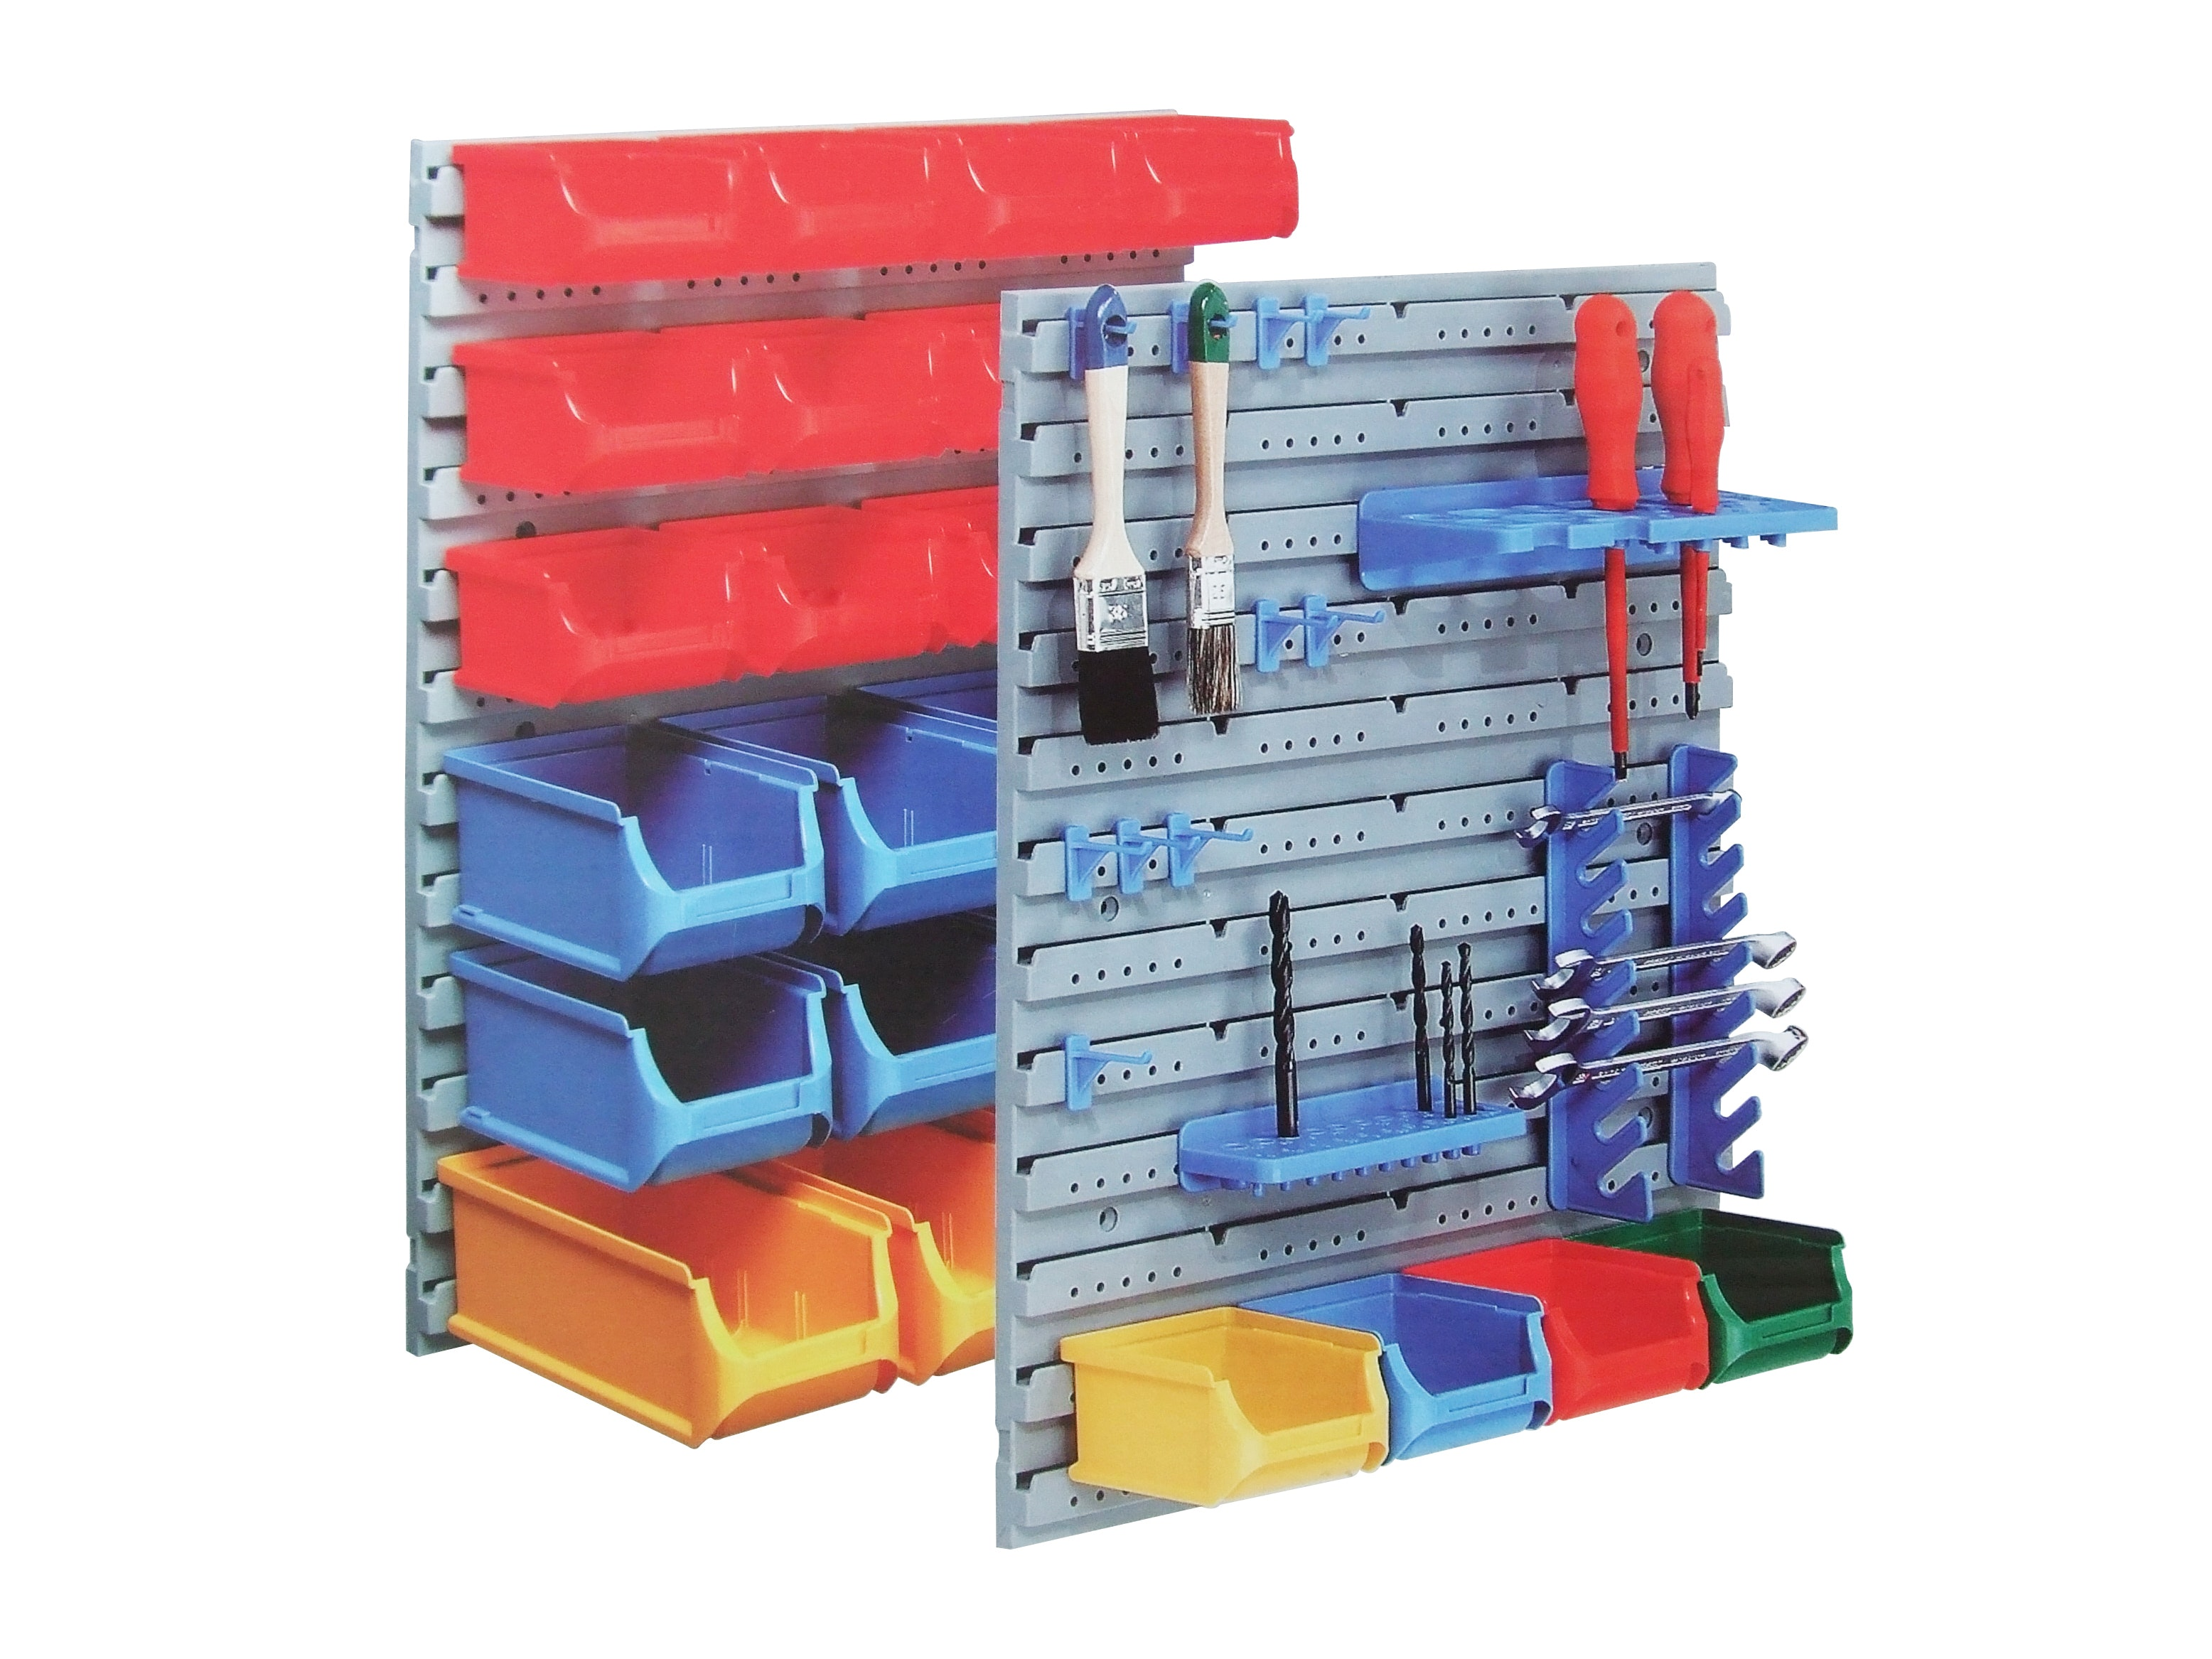 Multifunctional Organiser System